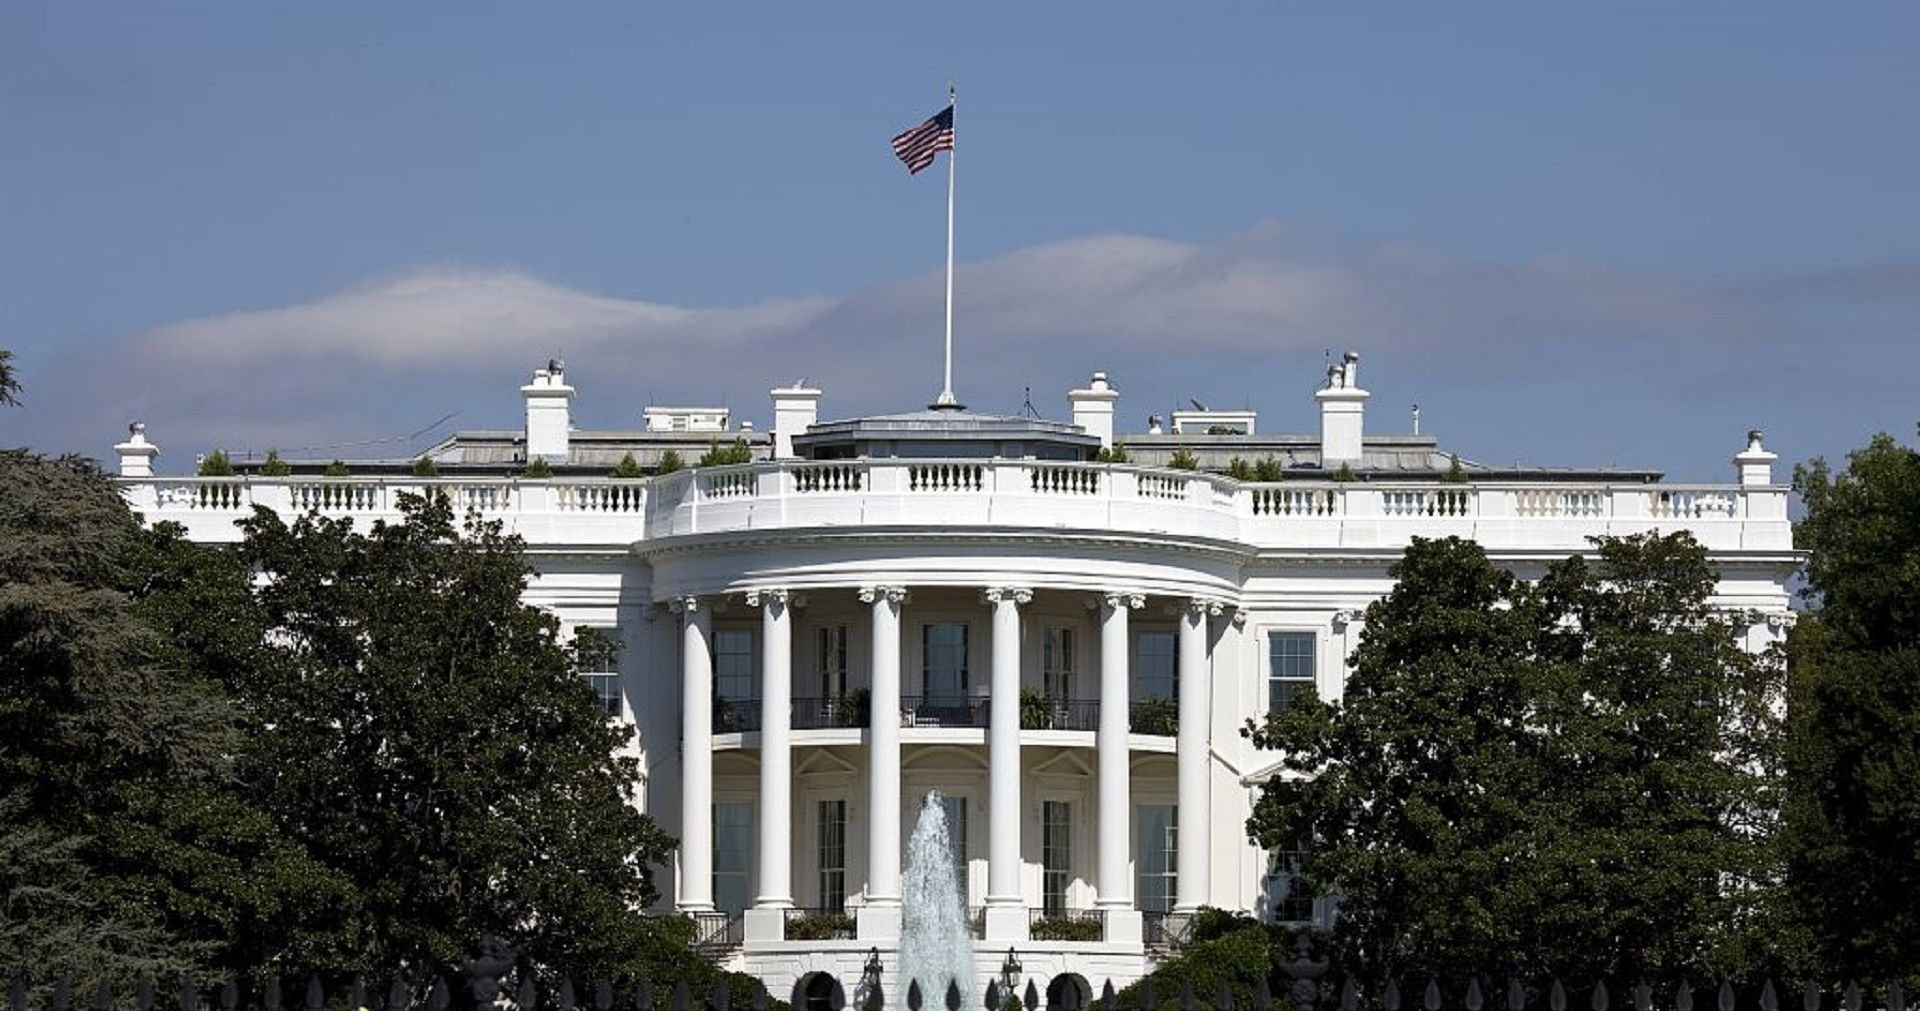 Trump i Moon Jae-in sastat će se 22. svibnja u Washingtonu